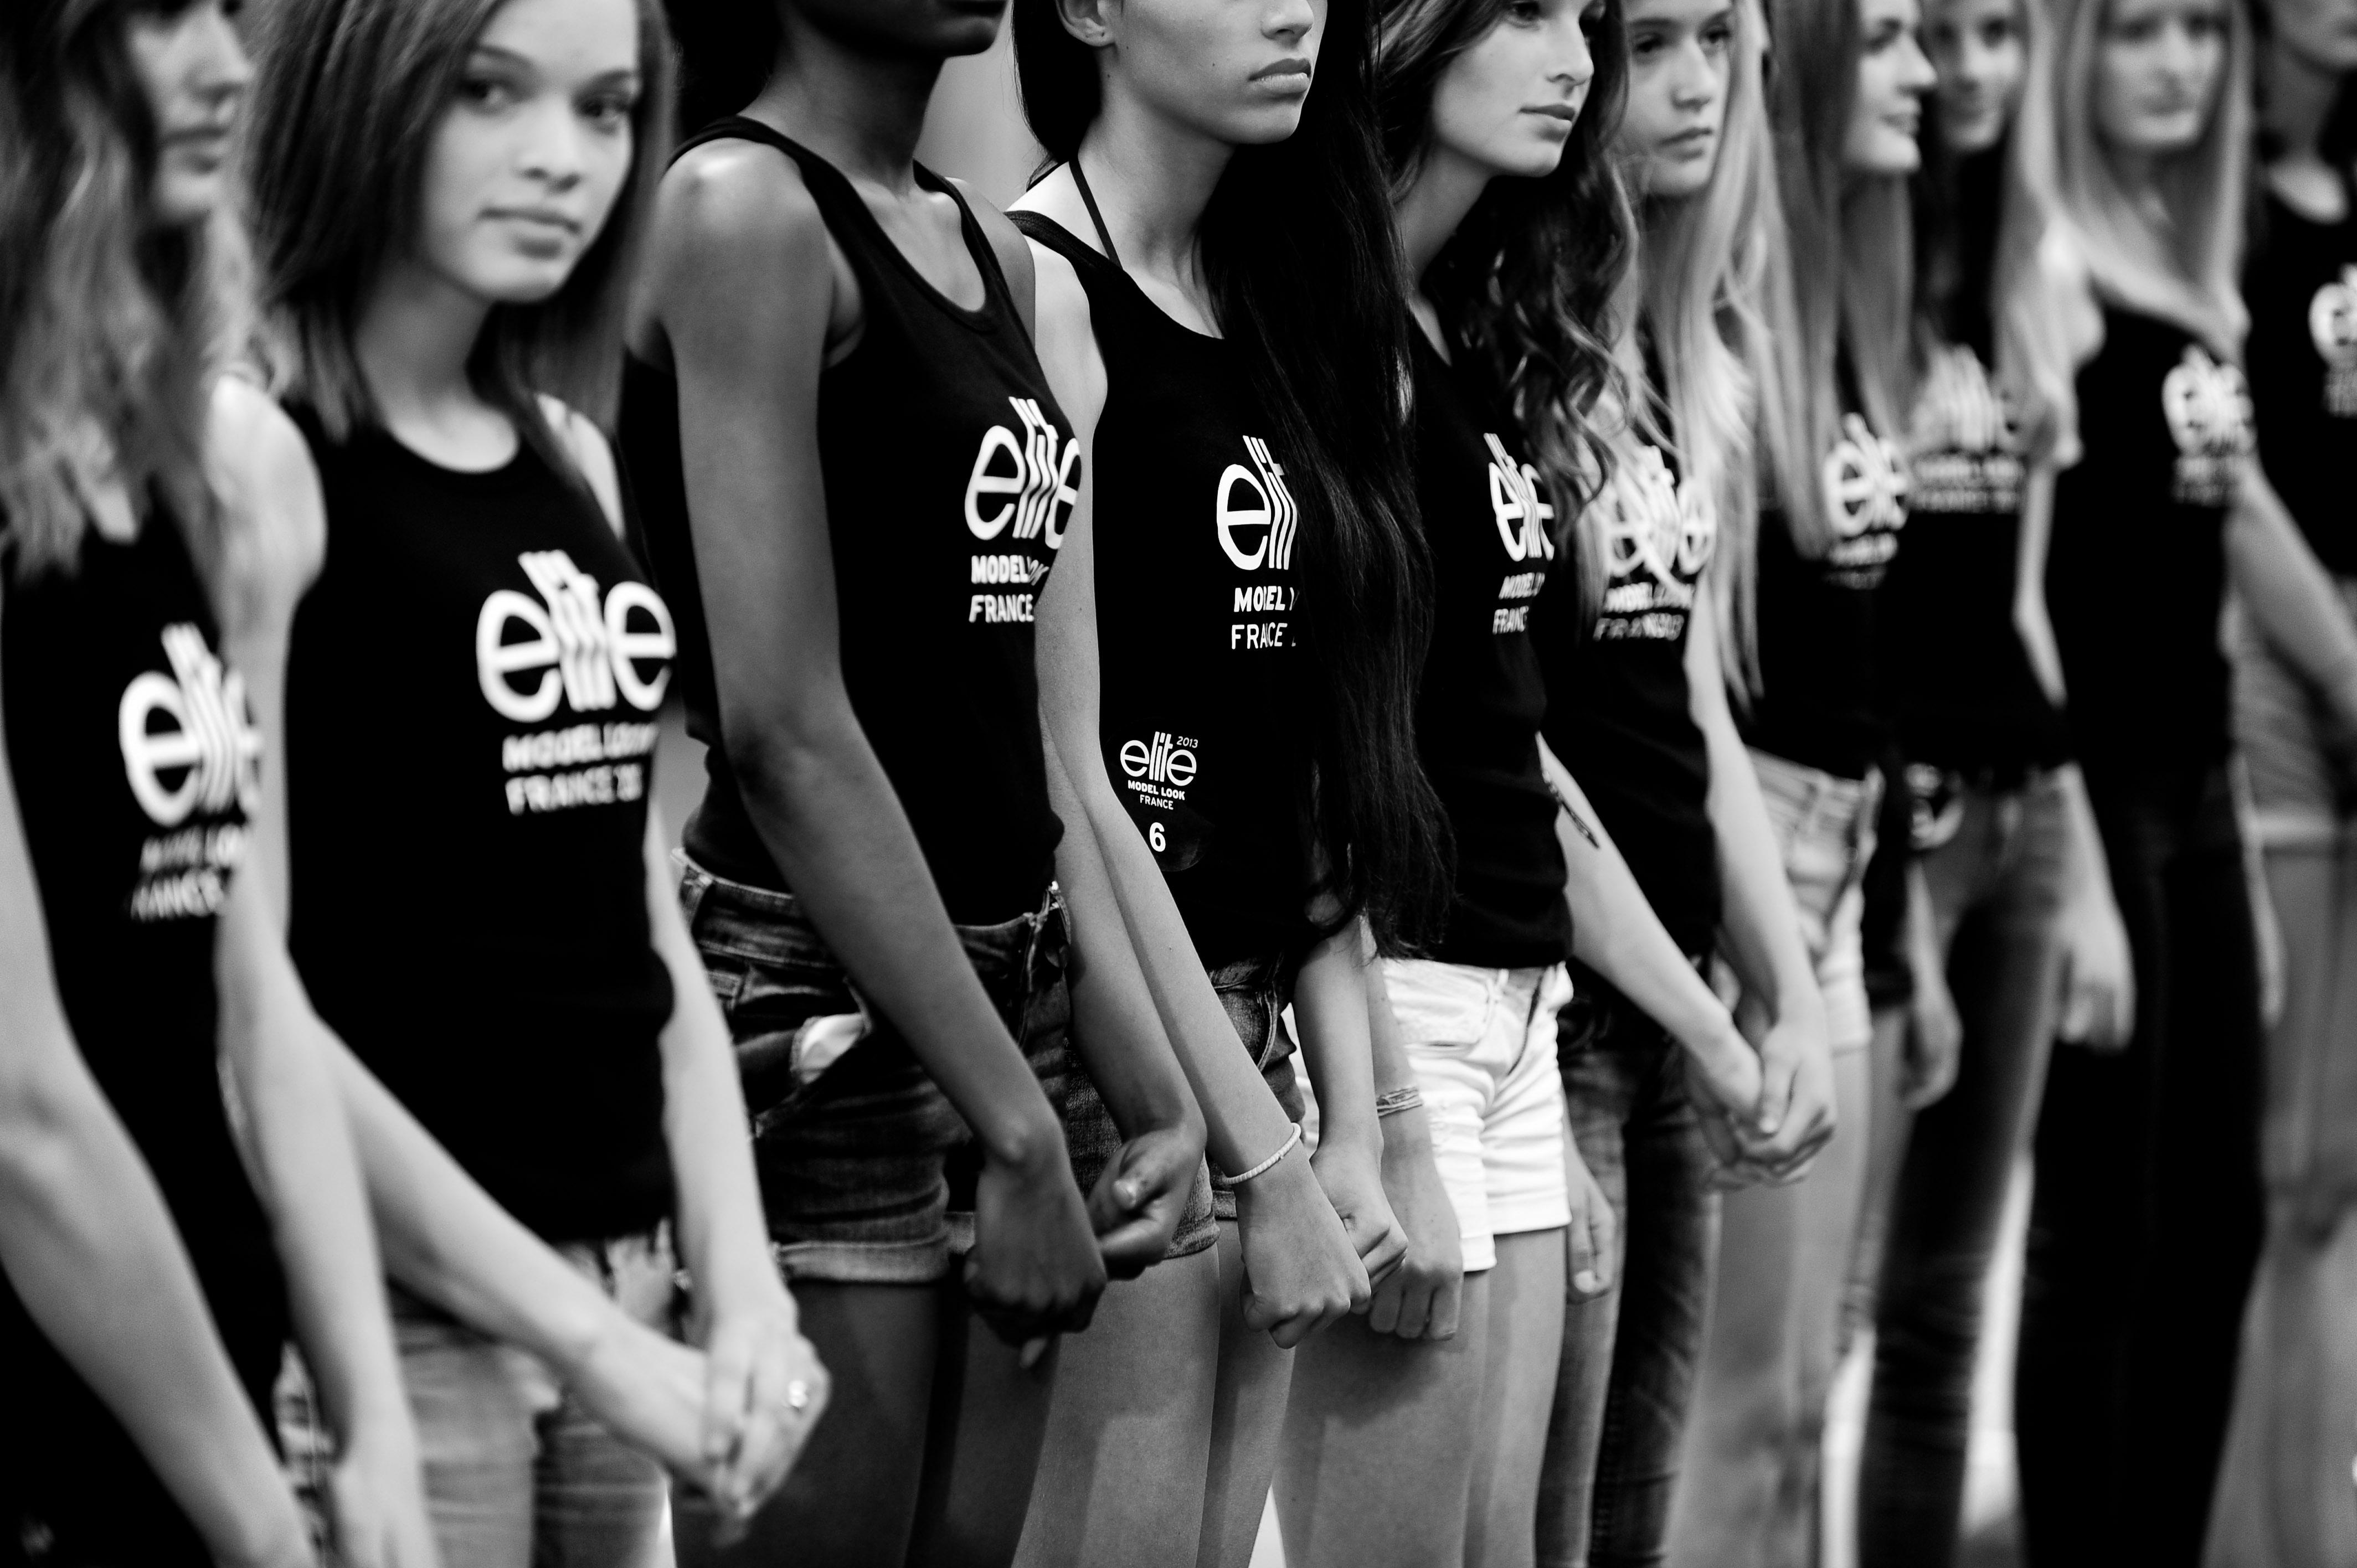 Elite Model Look 2014 - A la recherche des 12 finalistes   Maryo's Bazaar